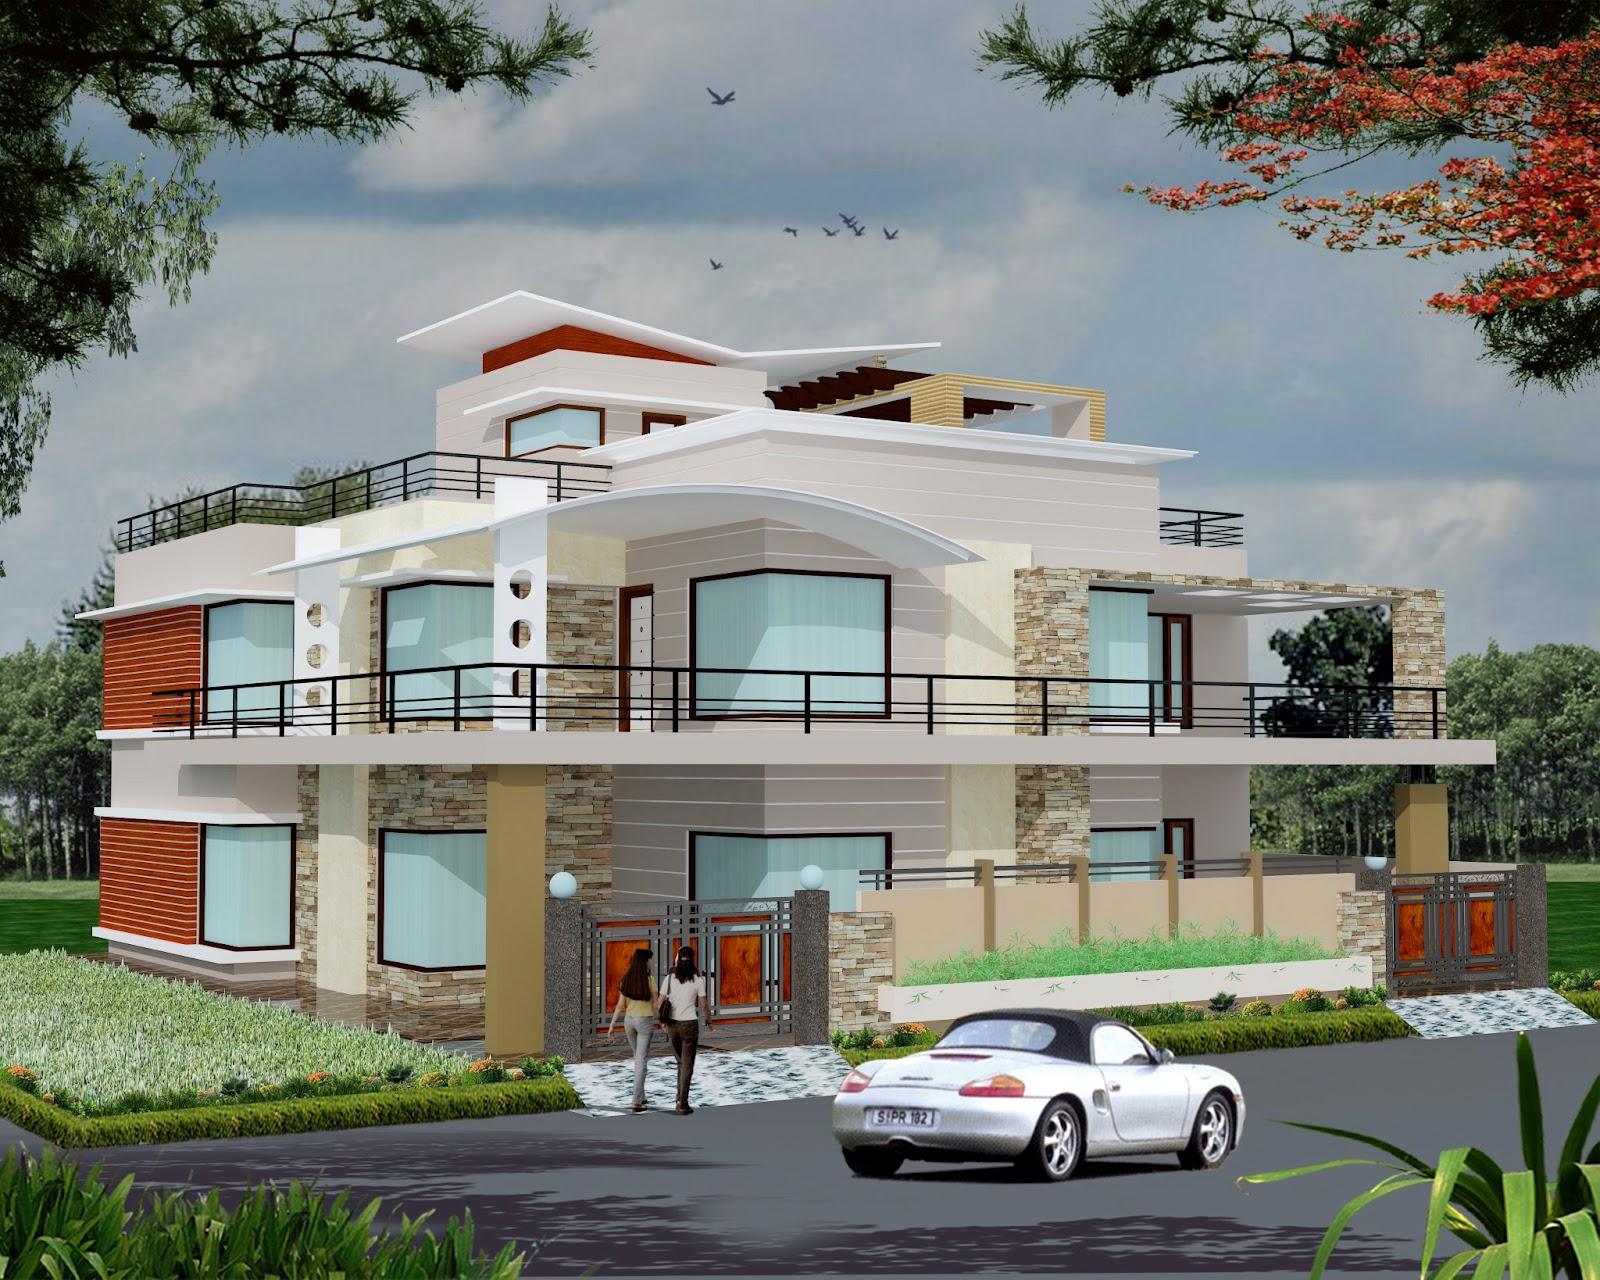 6 marla home design in india joy studio design gallery for House designs in pakistan